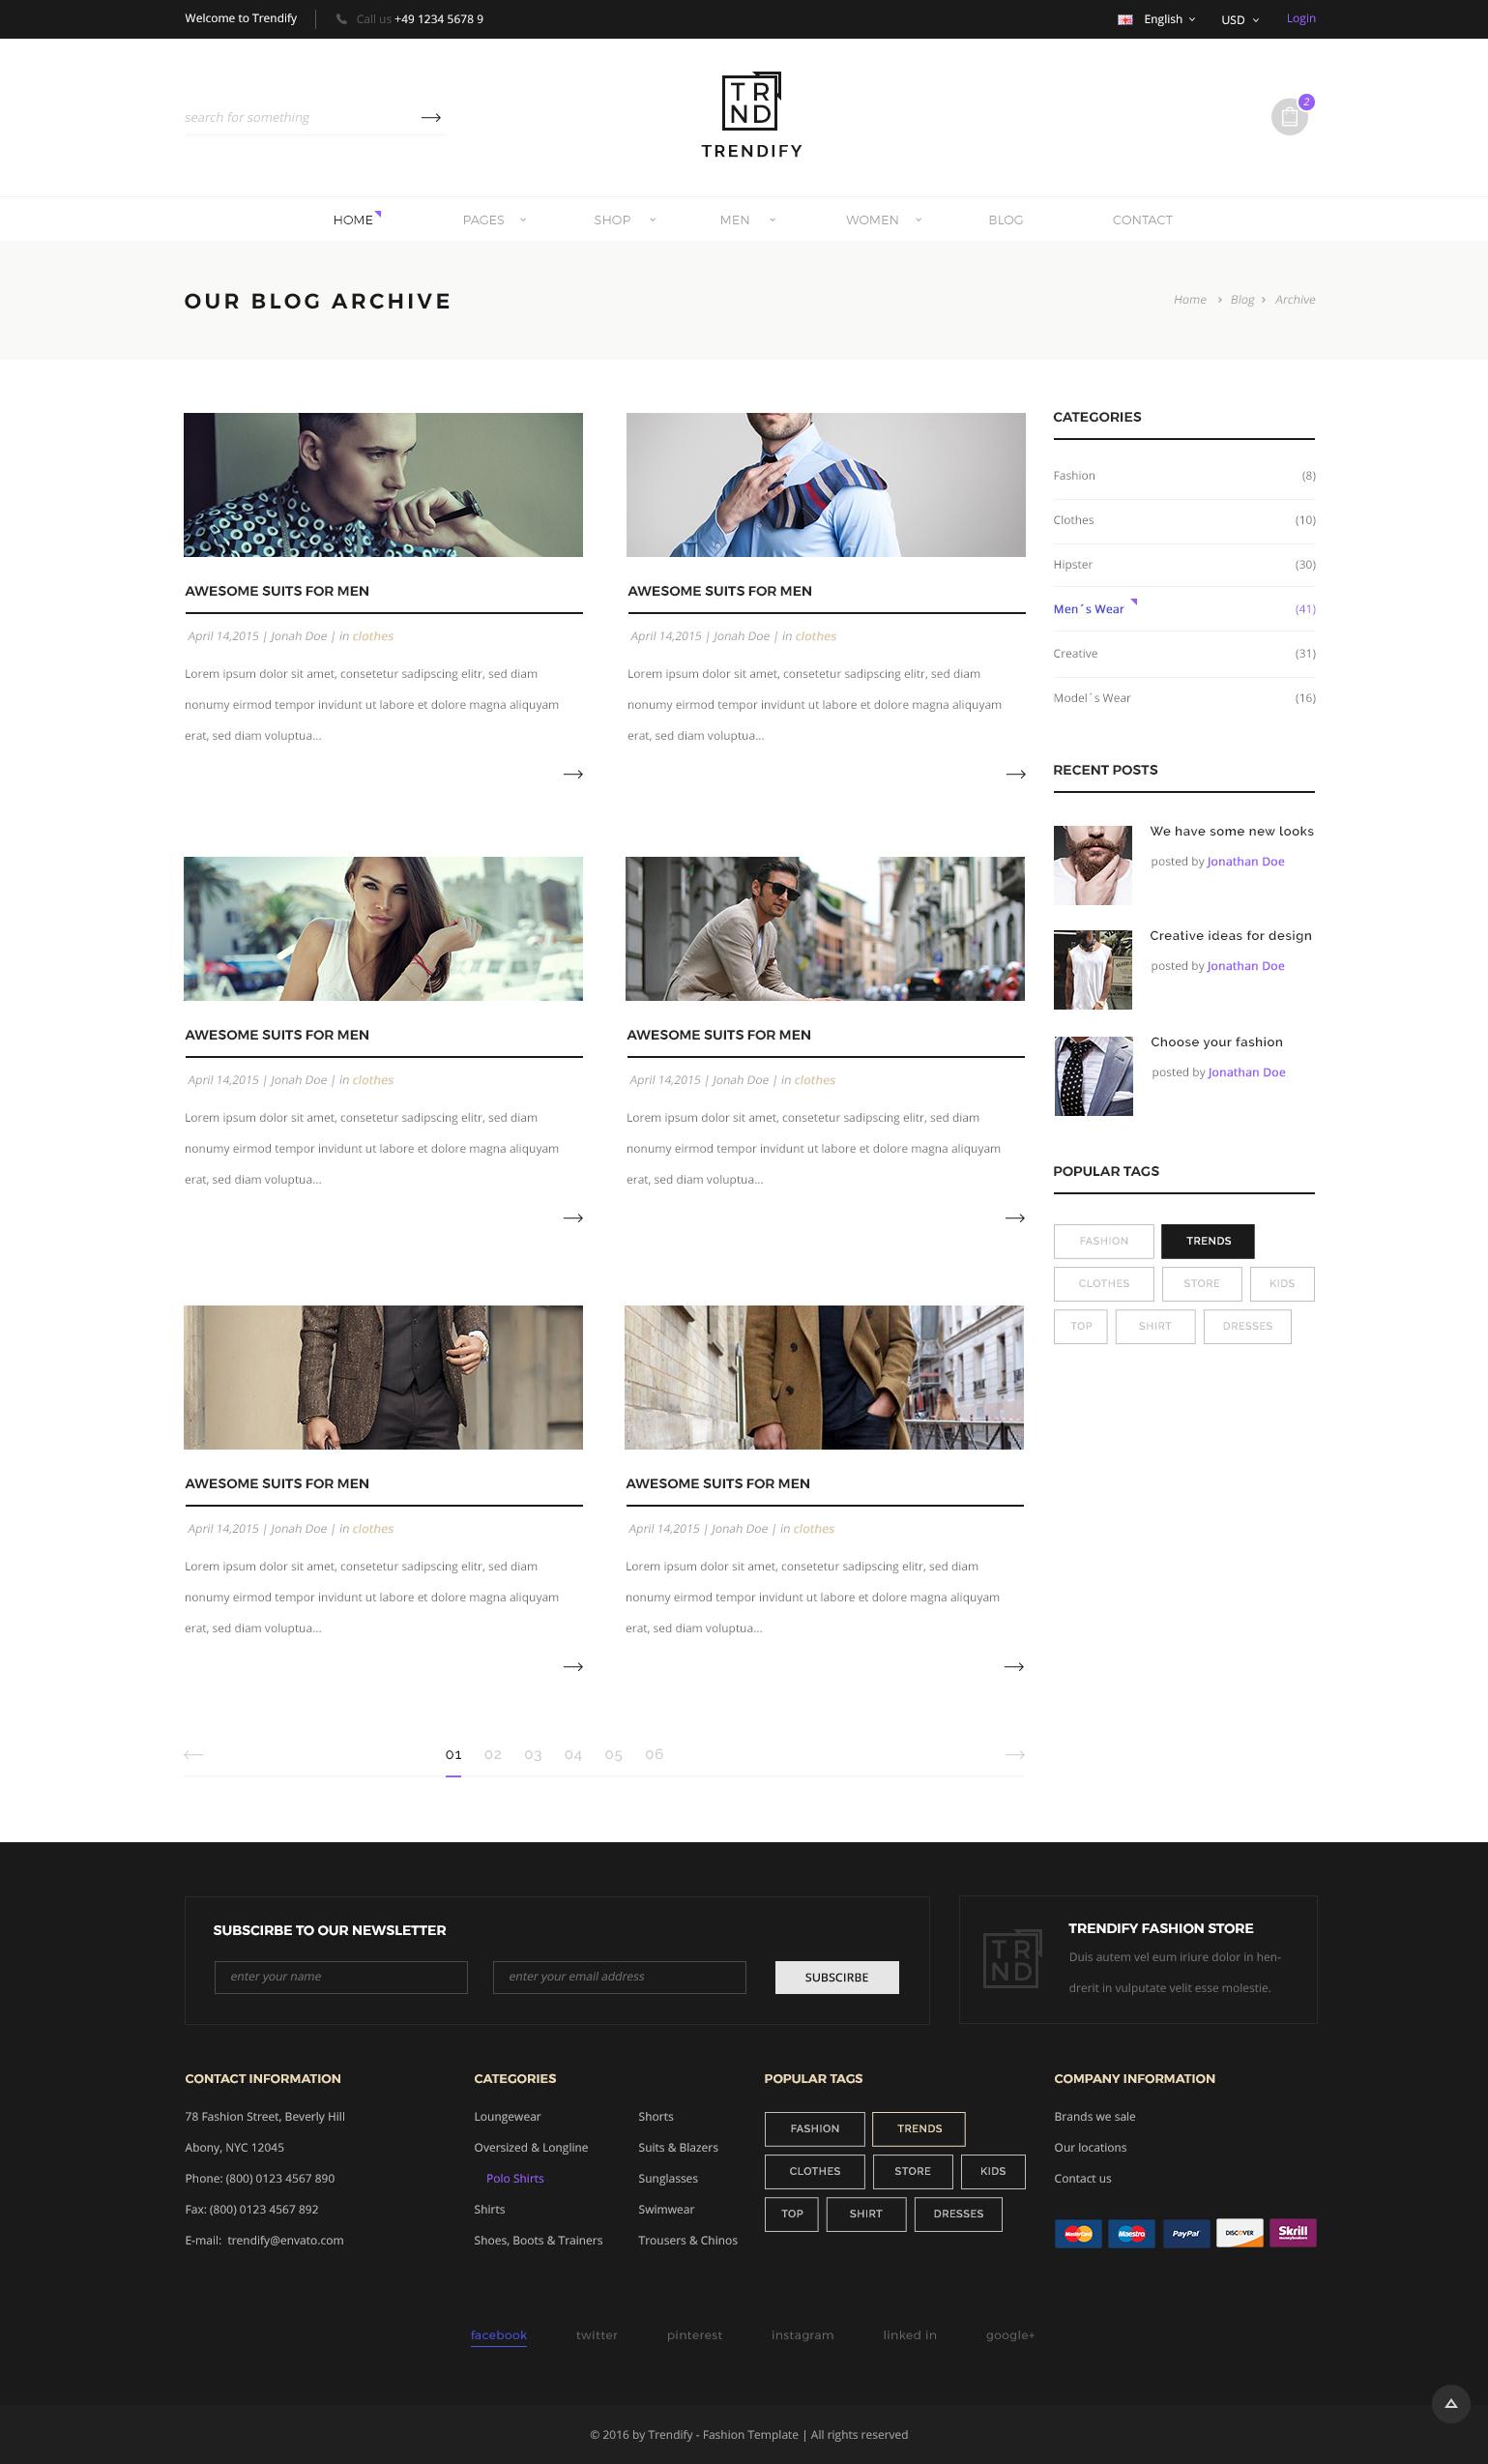 Trendify - Fashion eCommerce PSD template by KL-Webmedia ...